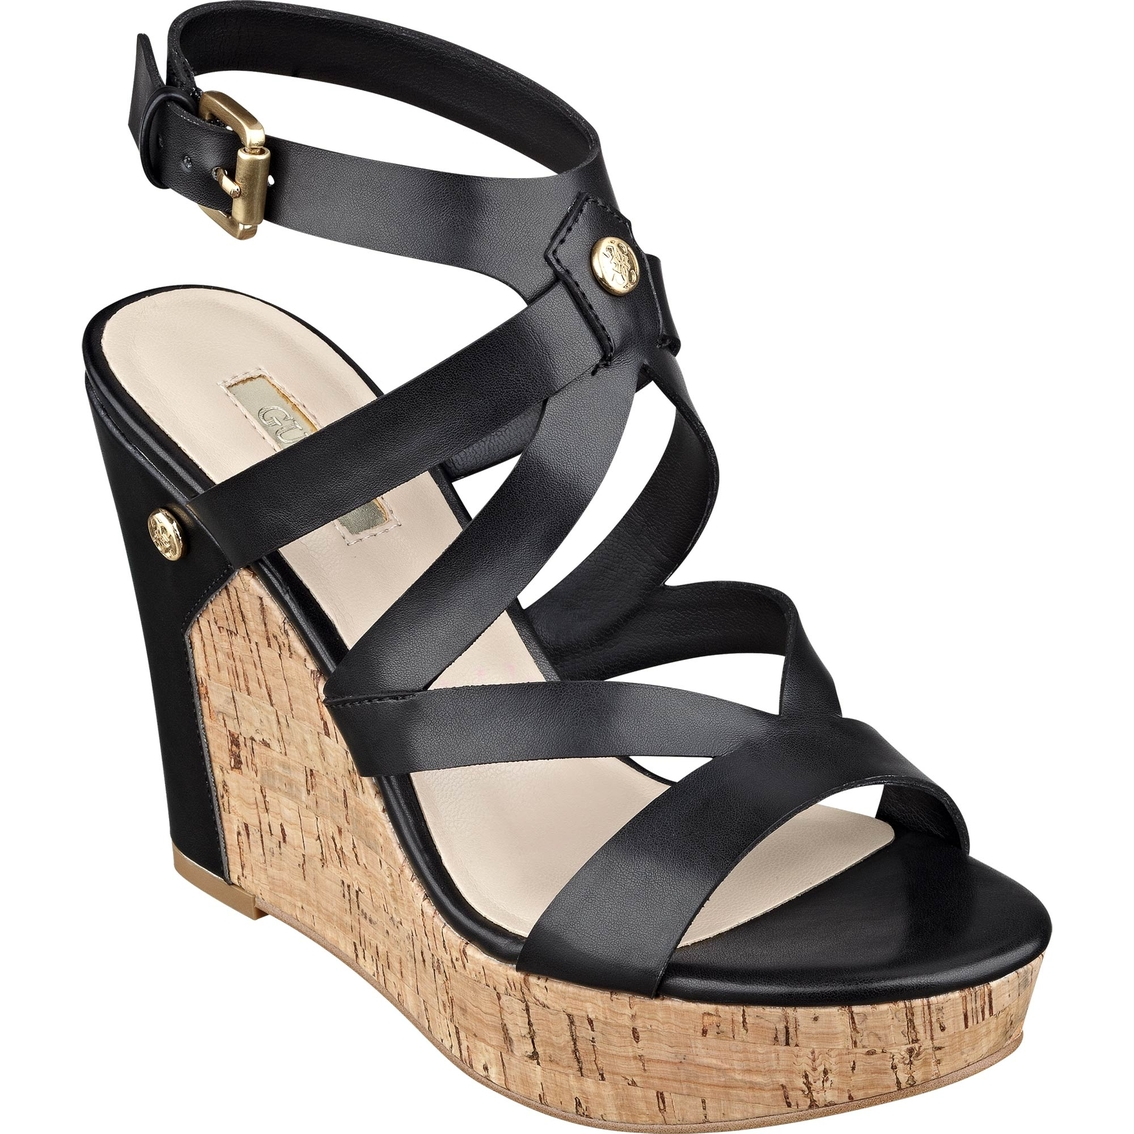 2ad449db50d6 Guess Harlee Cork Platform Wedge Sandals